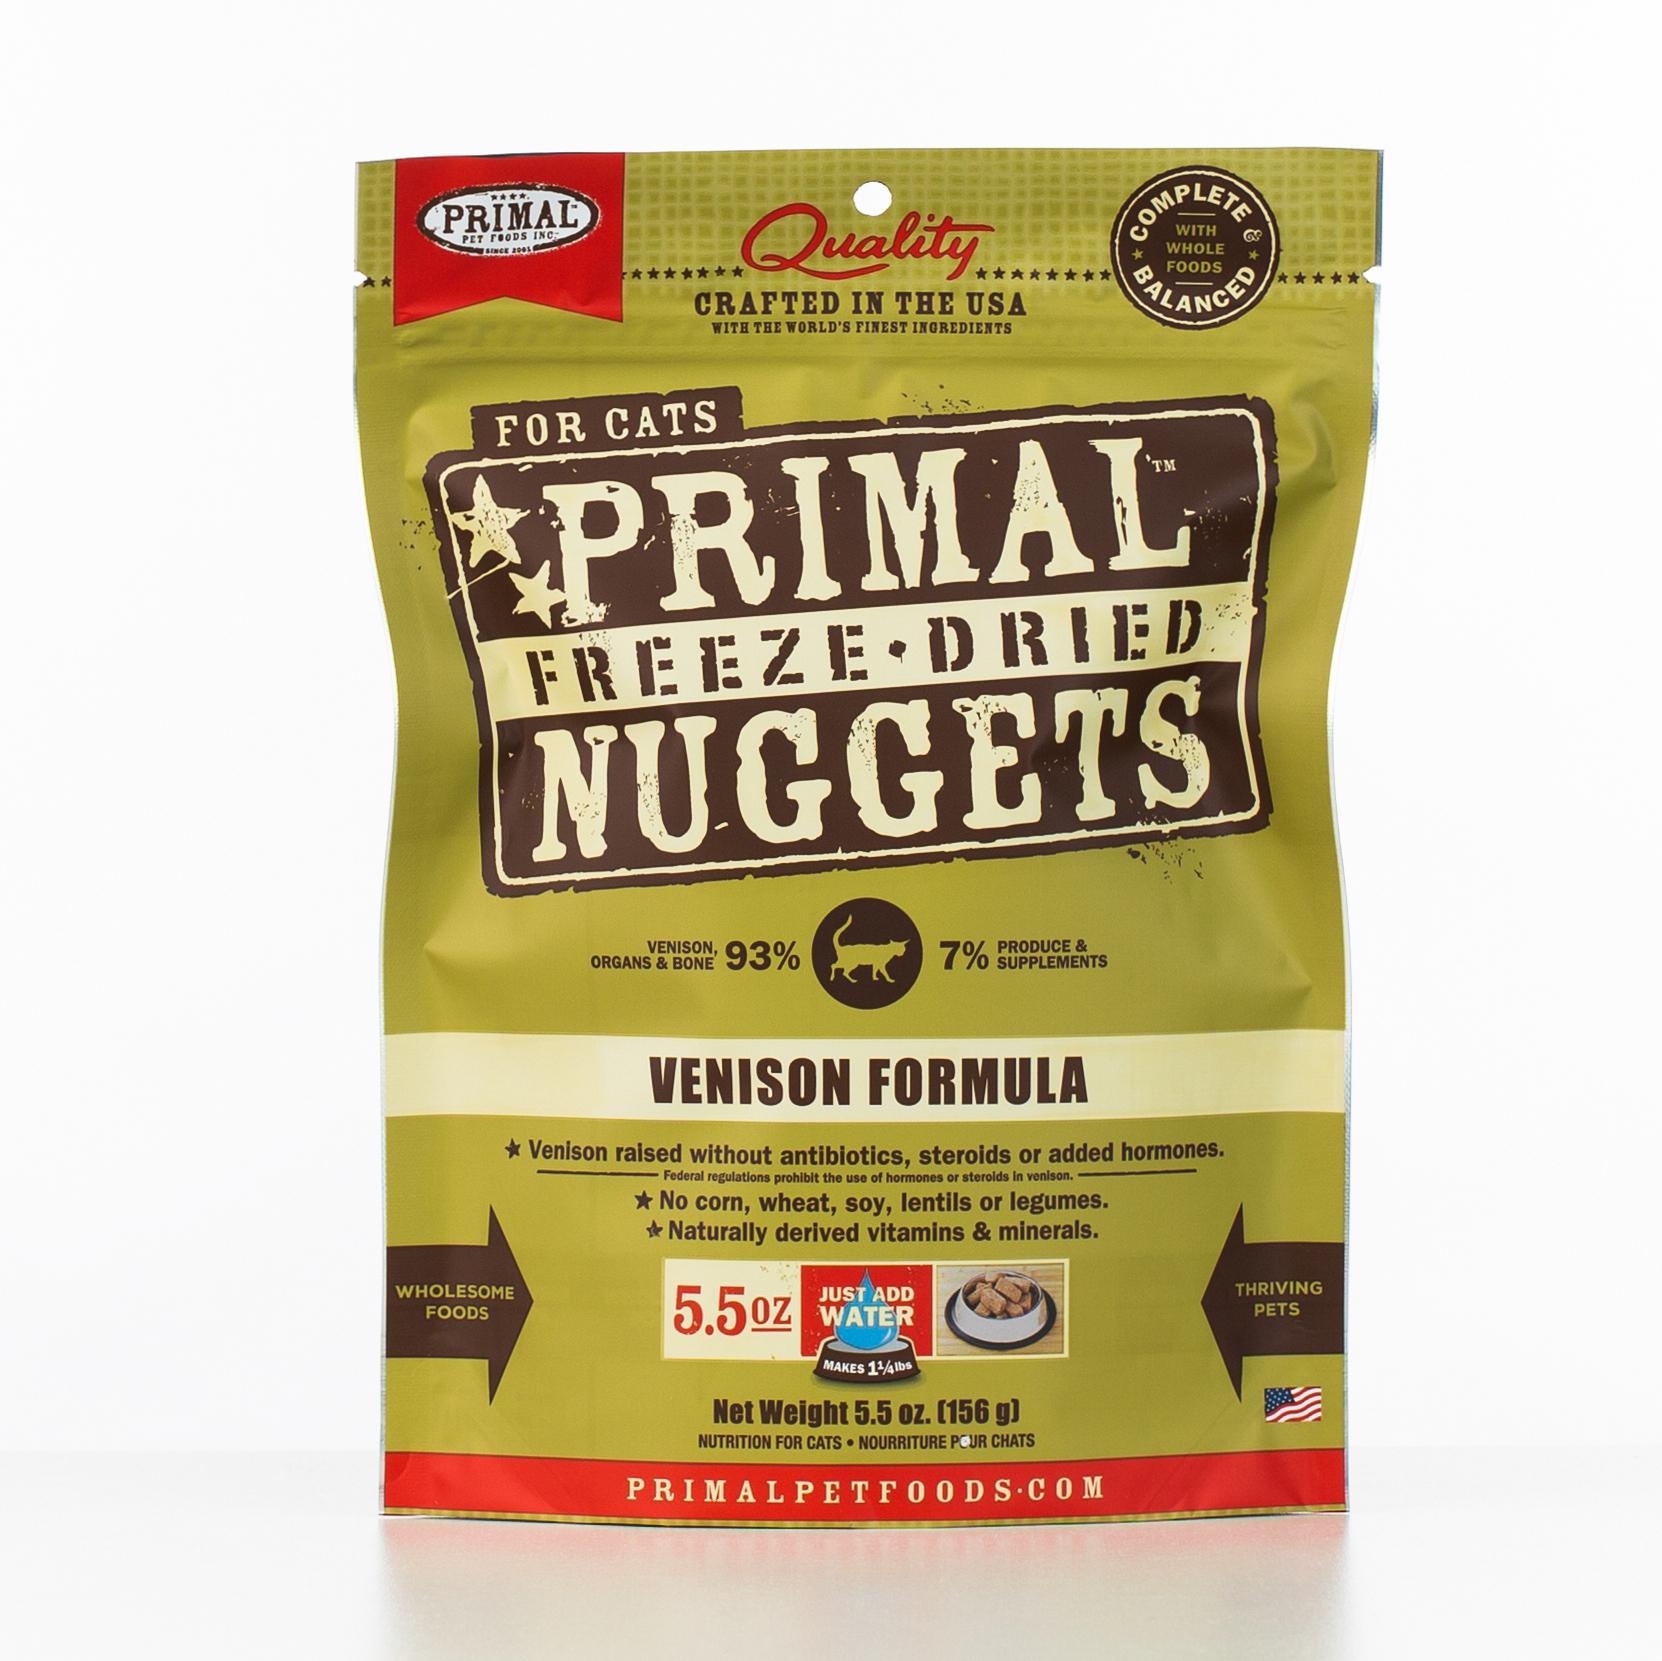 Primal Raw Freeze-Dried Nuggets Venison Formula Cat Food Image